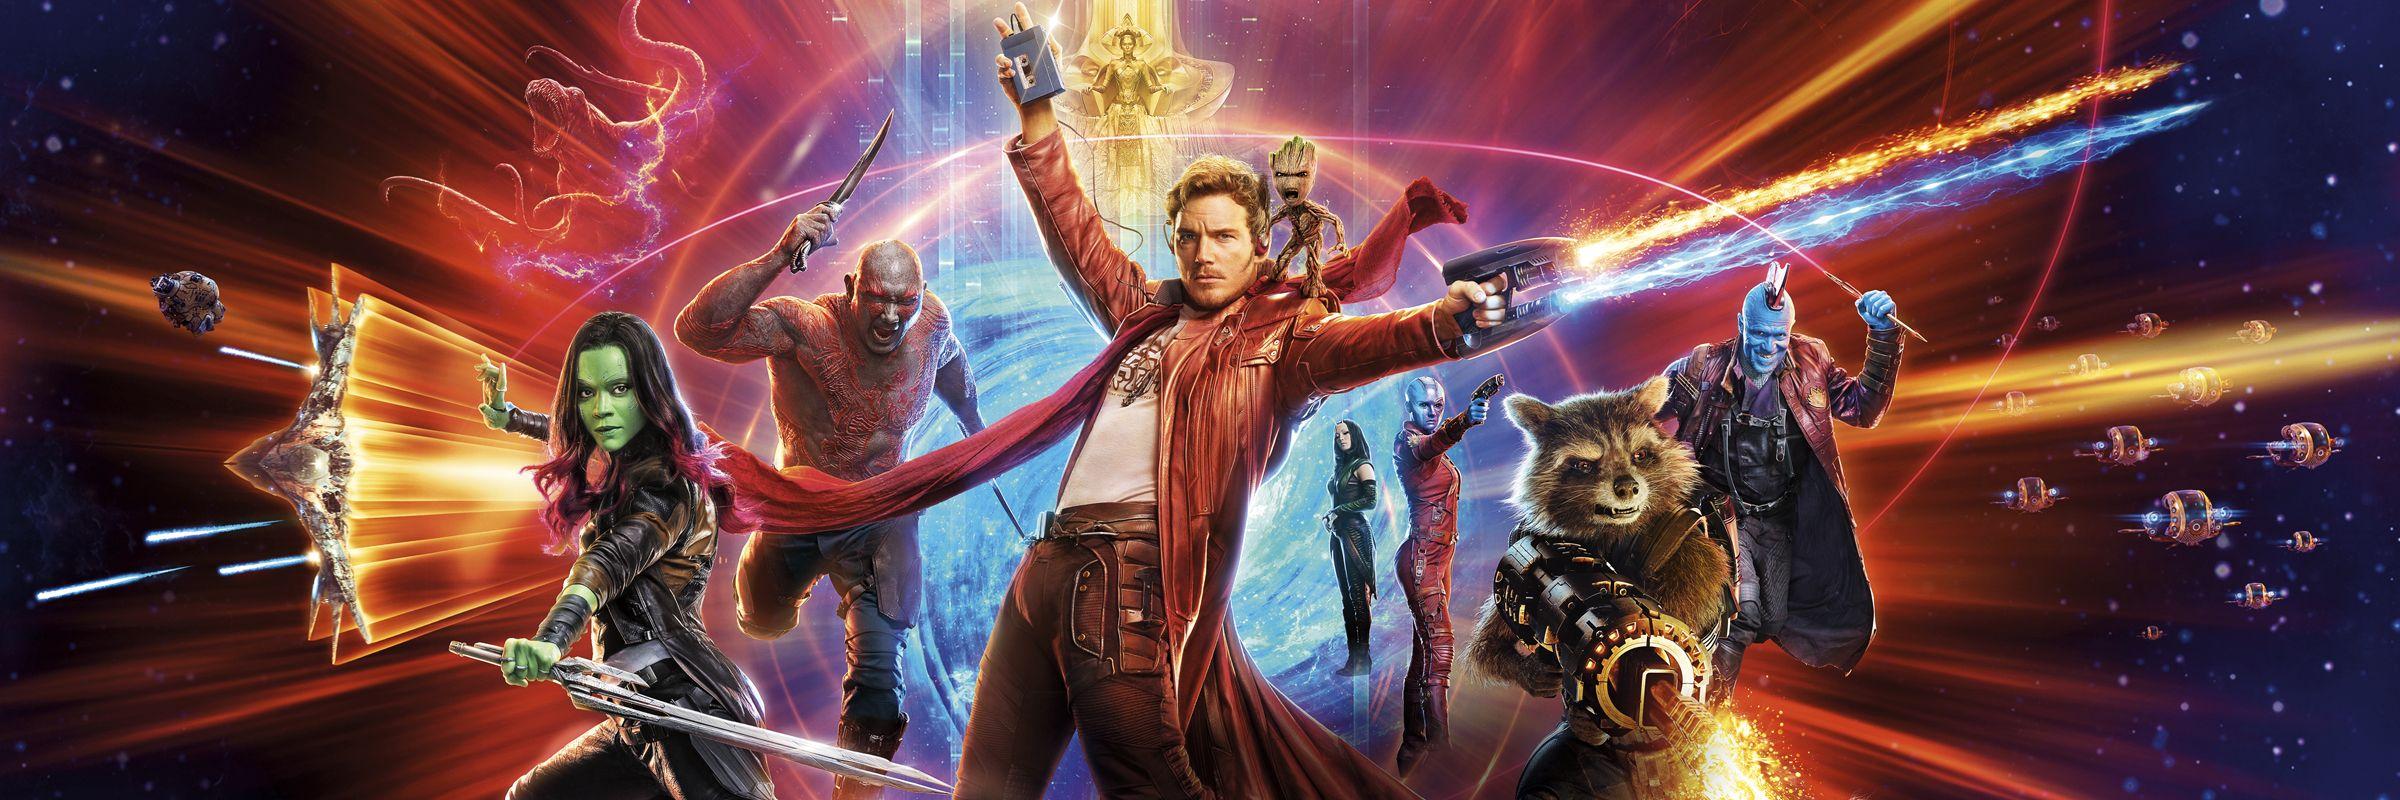 Marvel Studios' Guardians of the Galaxy Vol  2 | Full Movie